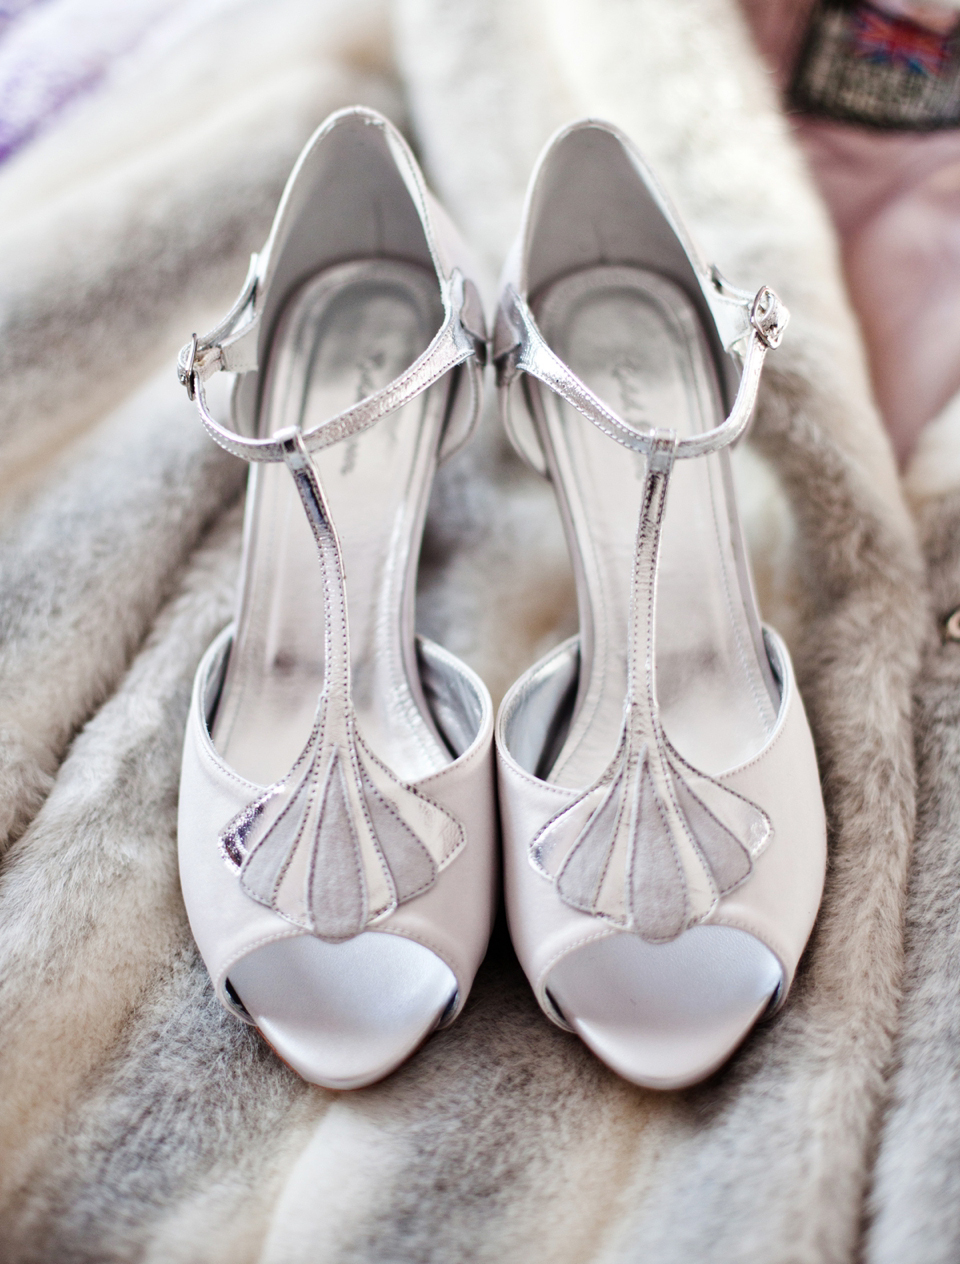 Vintage Inspired Wedding Shoes 22 Best An Elegant uAudrey Hepburn